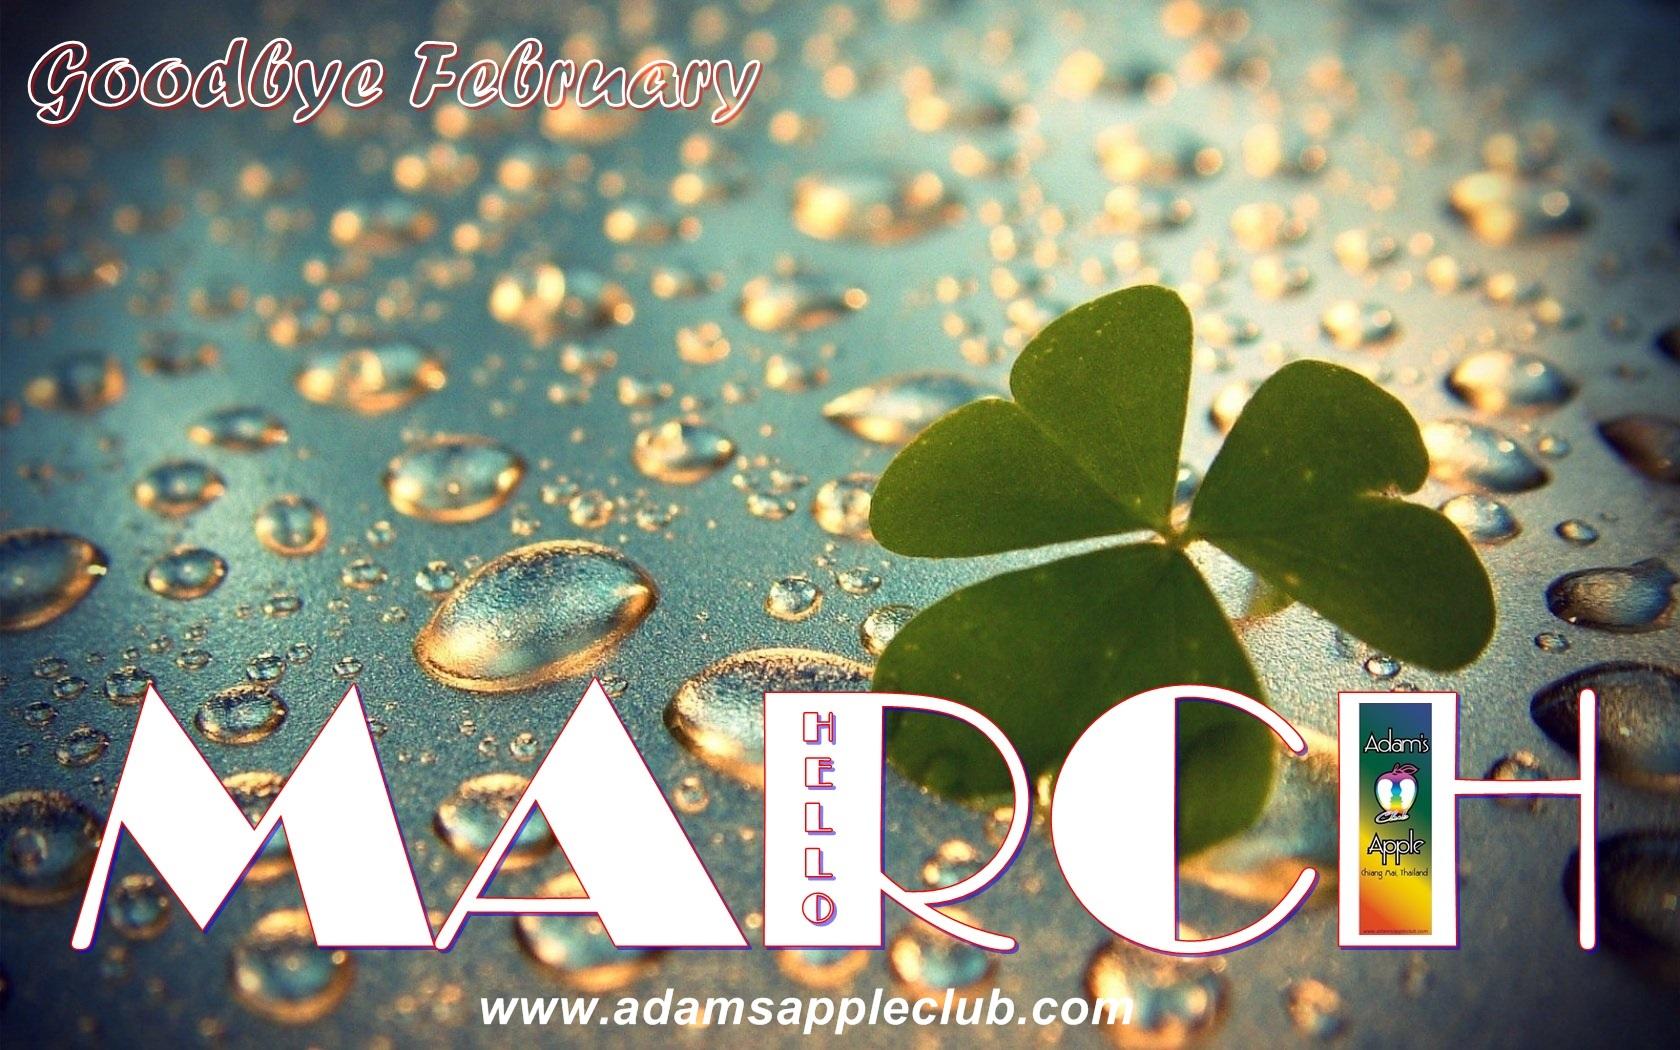 Adams Apple Club Chiang Mai MARCH 2019